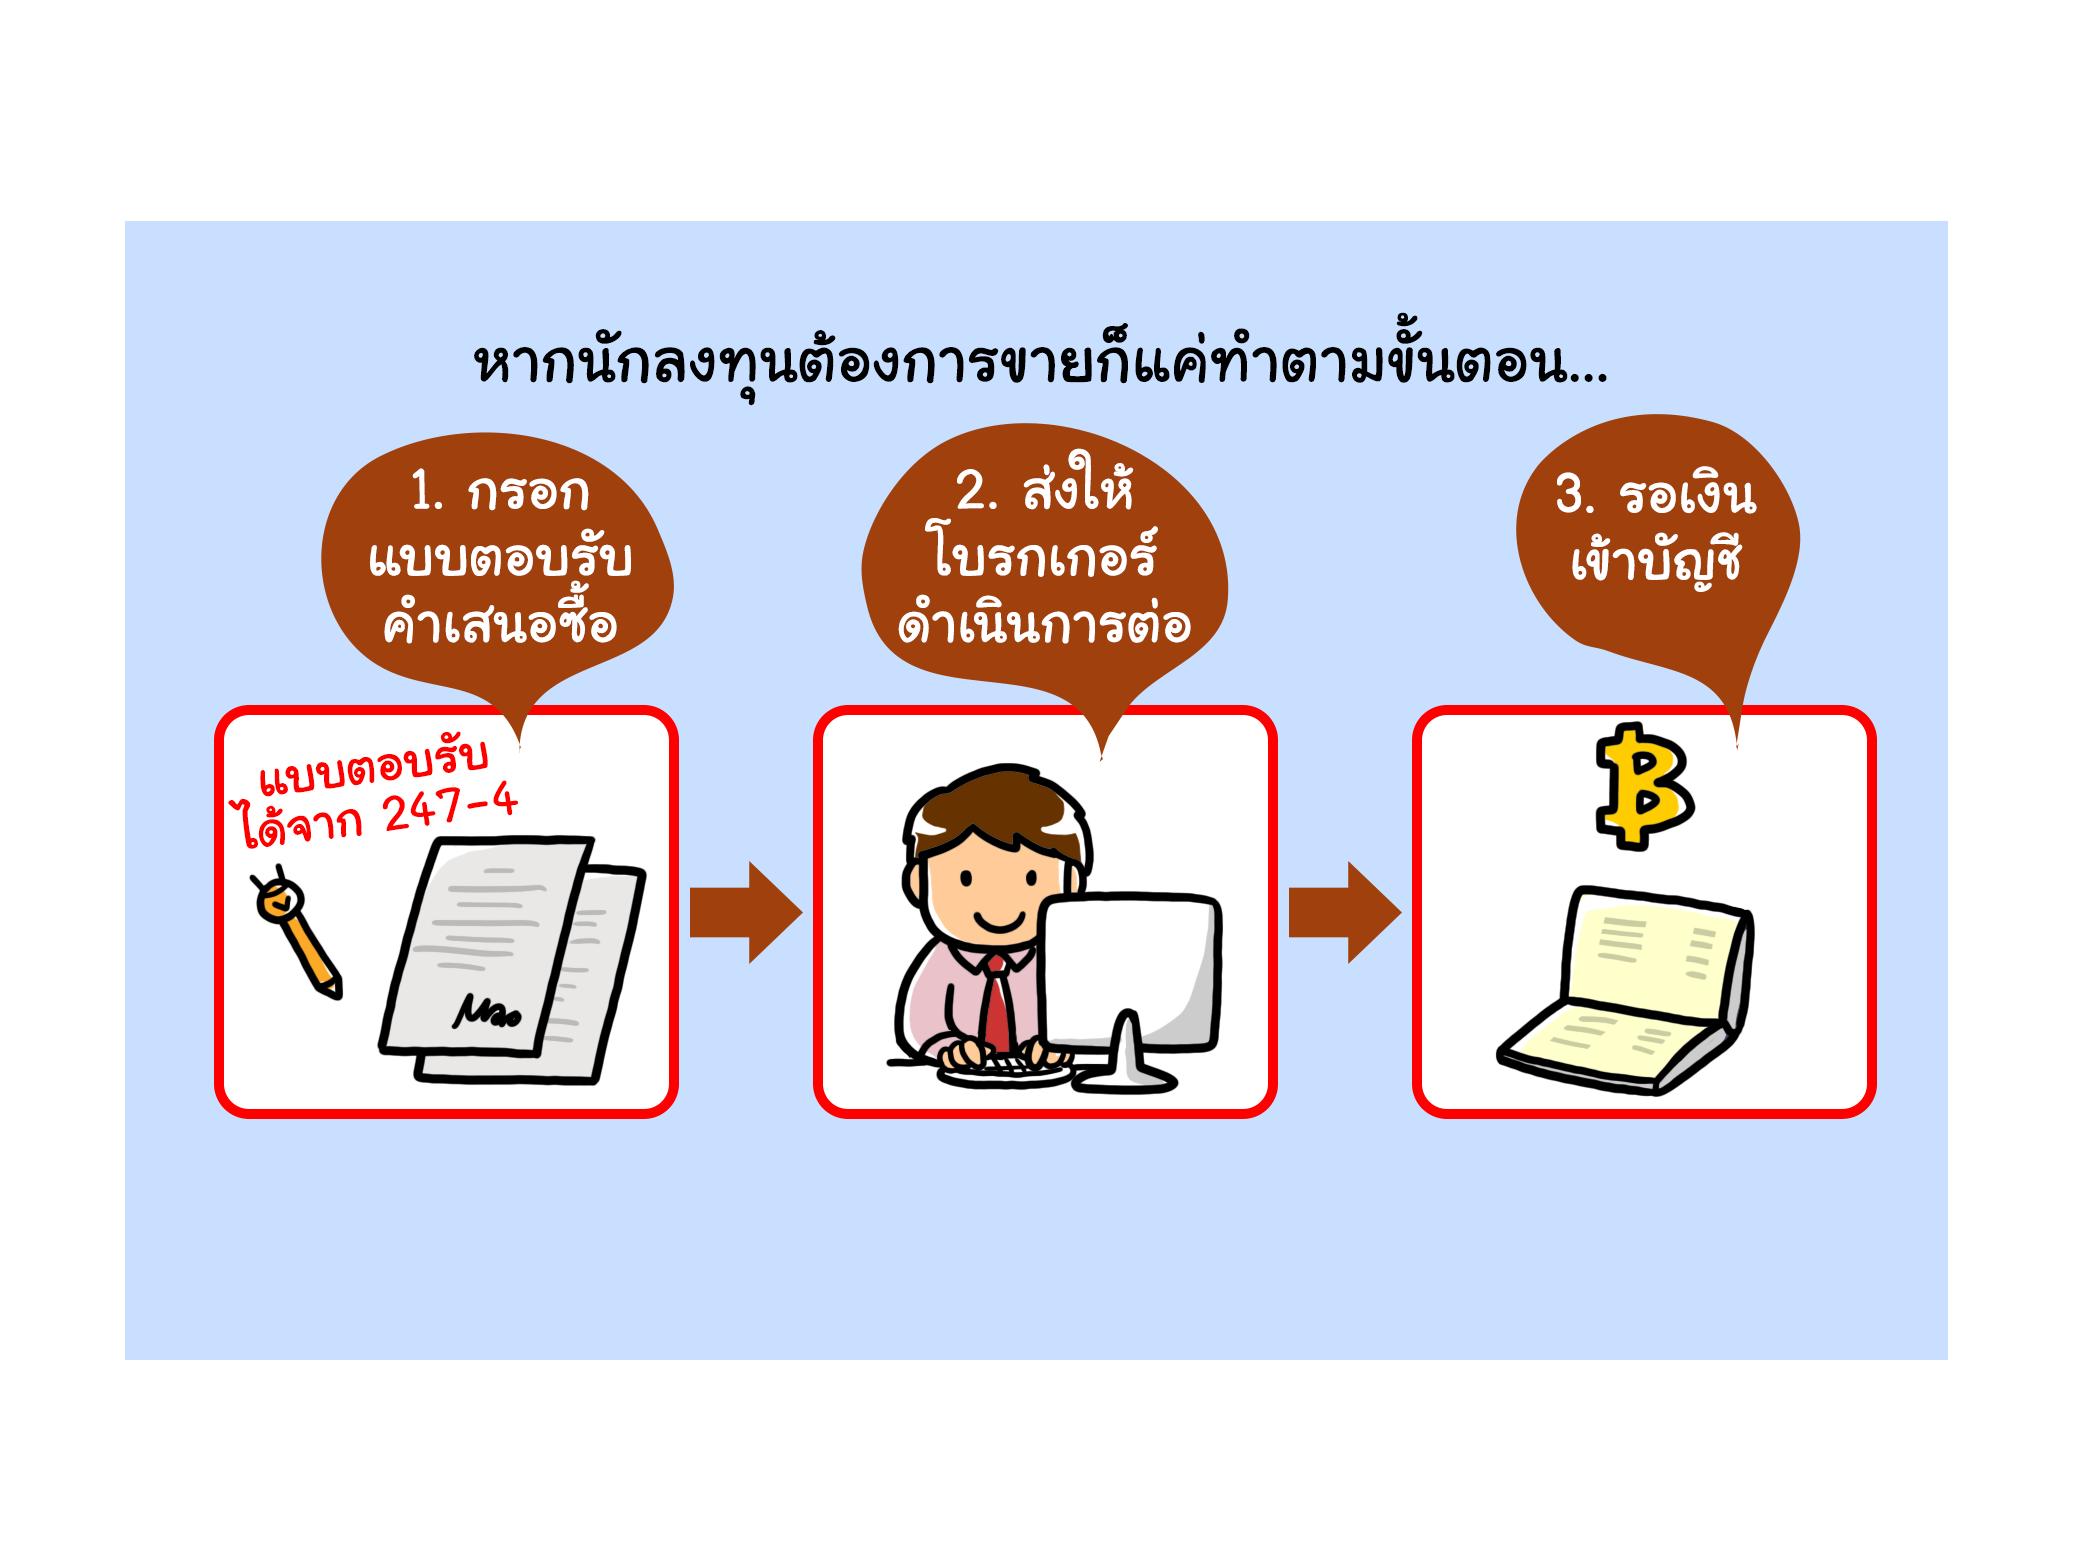 www maoinvestor com/wp-content/uploads/2019/05/mao